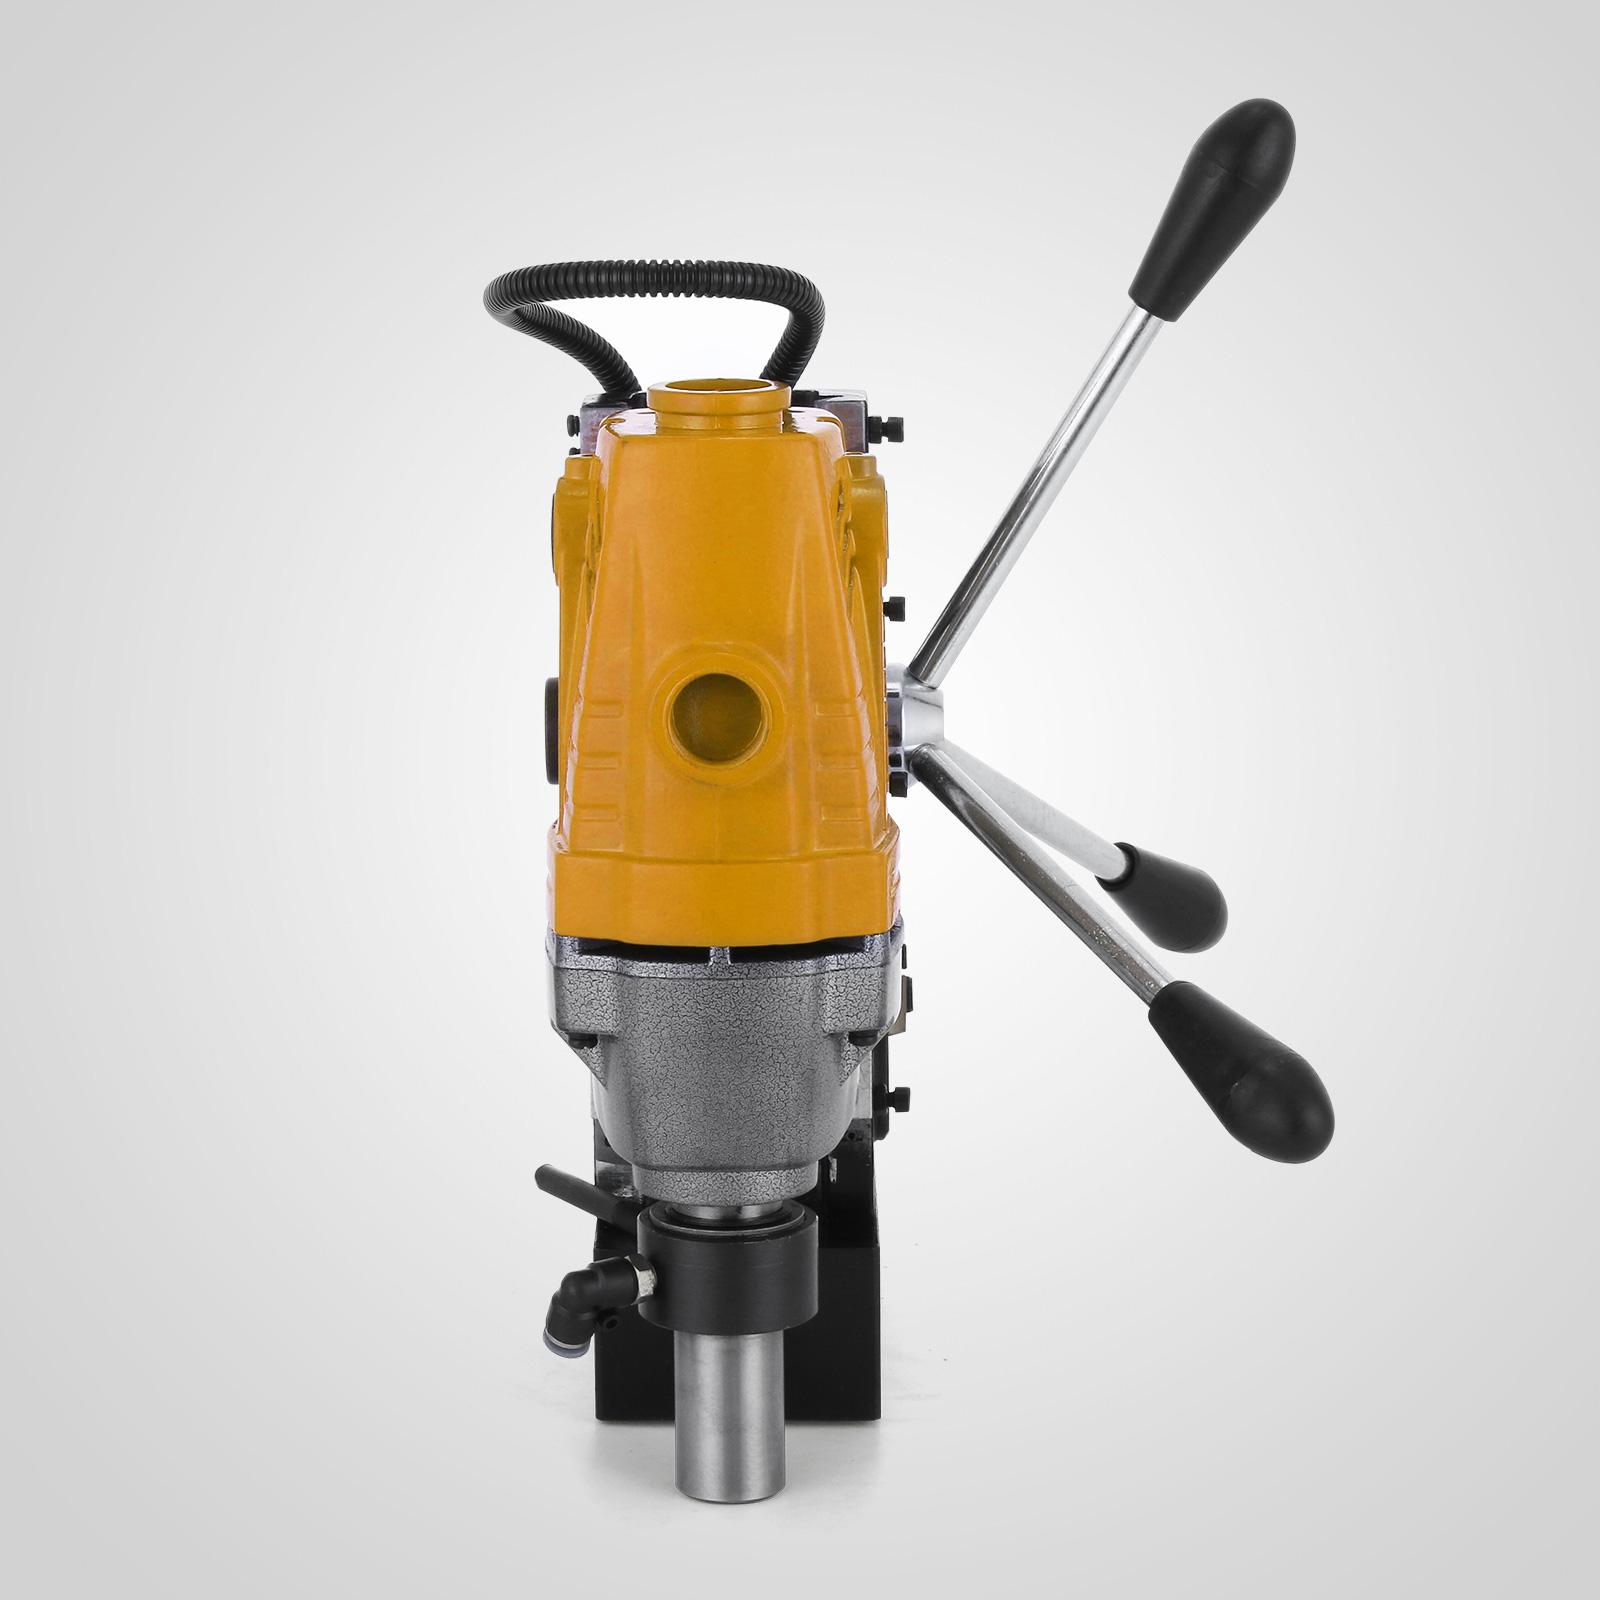 MB23-BRM35-MD40-Trapano-Perforatrice-Carotatore-Fresa-Magnetico-12-40mm-230V miniatura 43